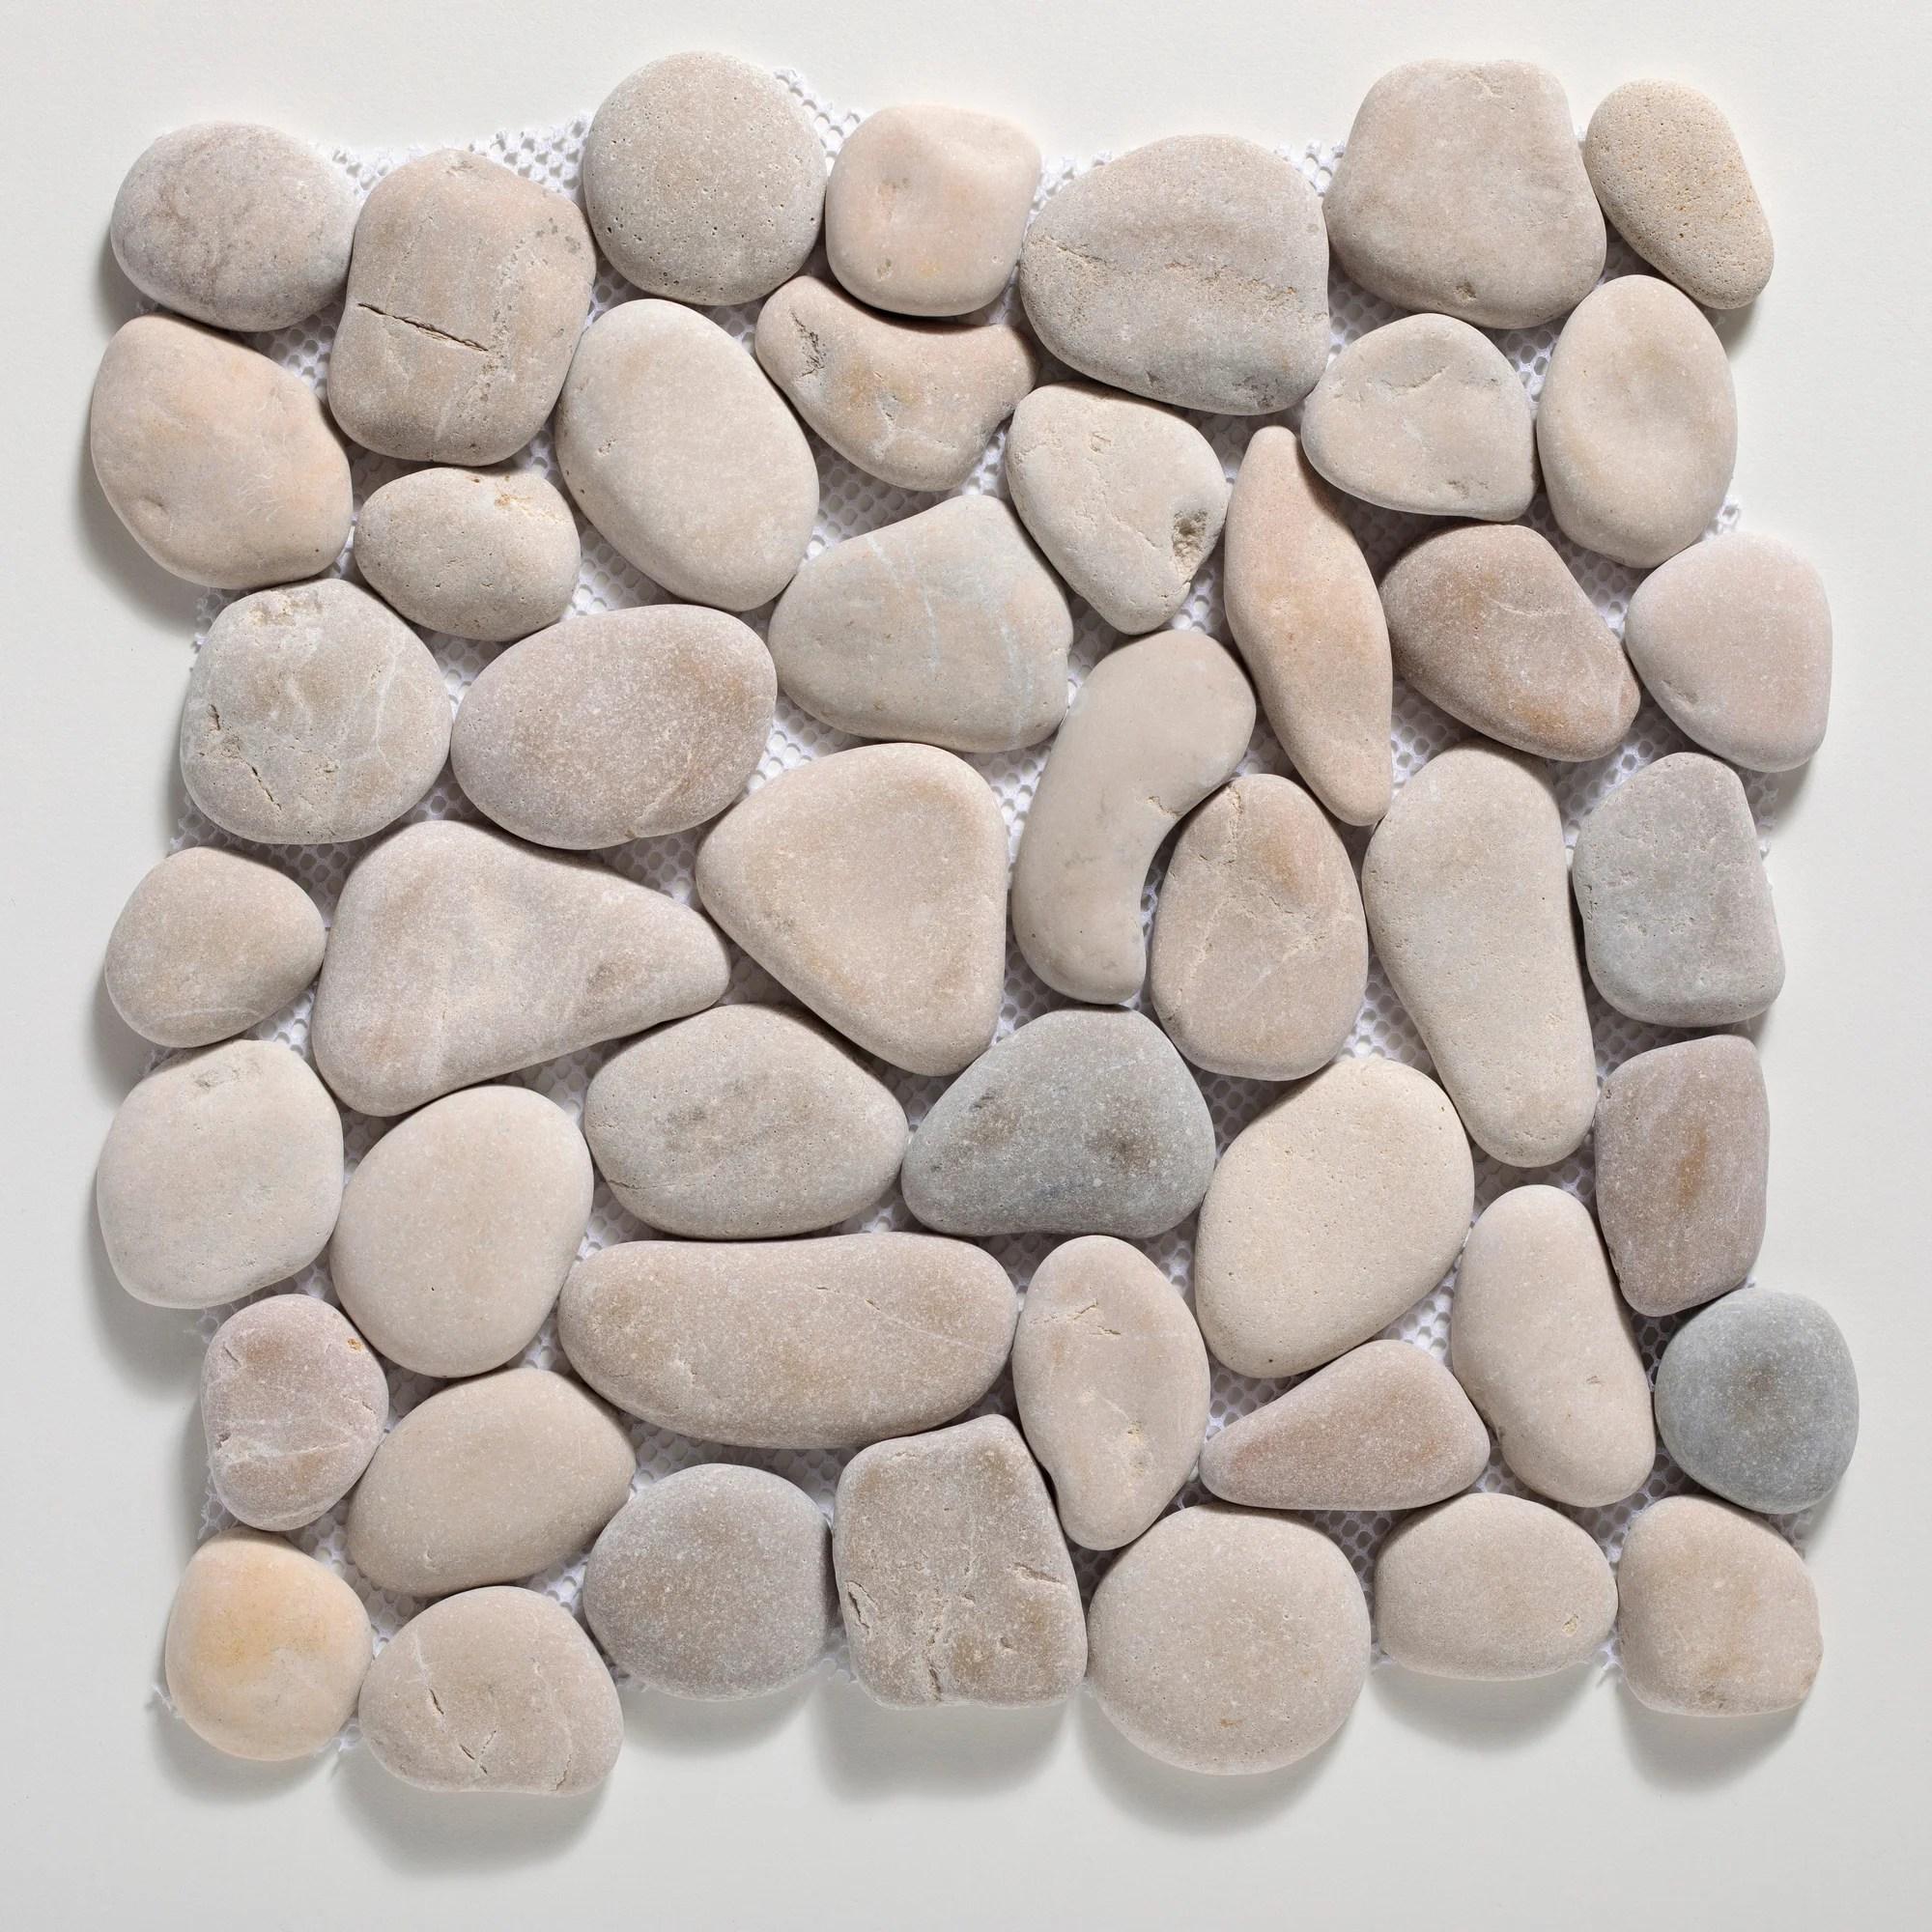 tile connection classic random sized natural stone pebbles mosaic wall floor tile reviews wayfair